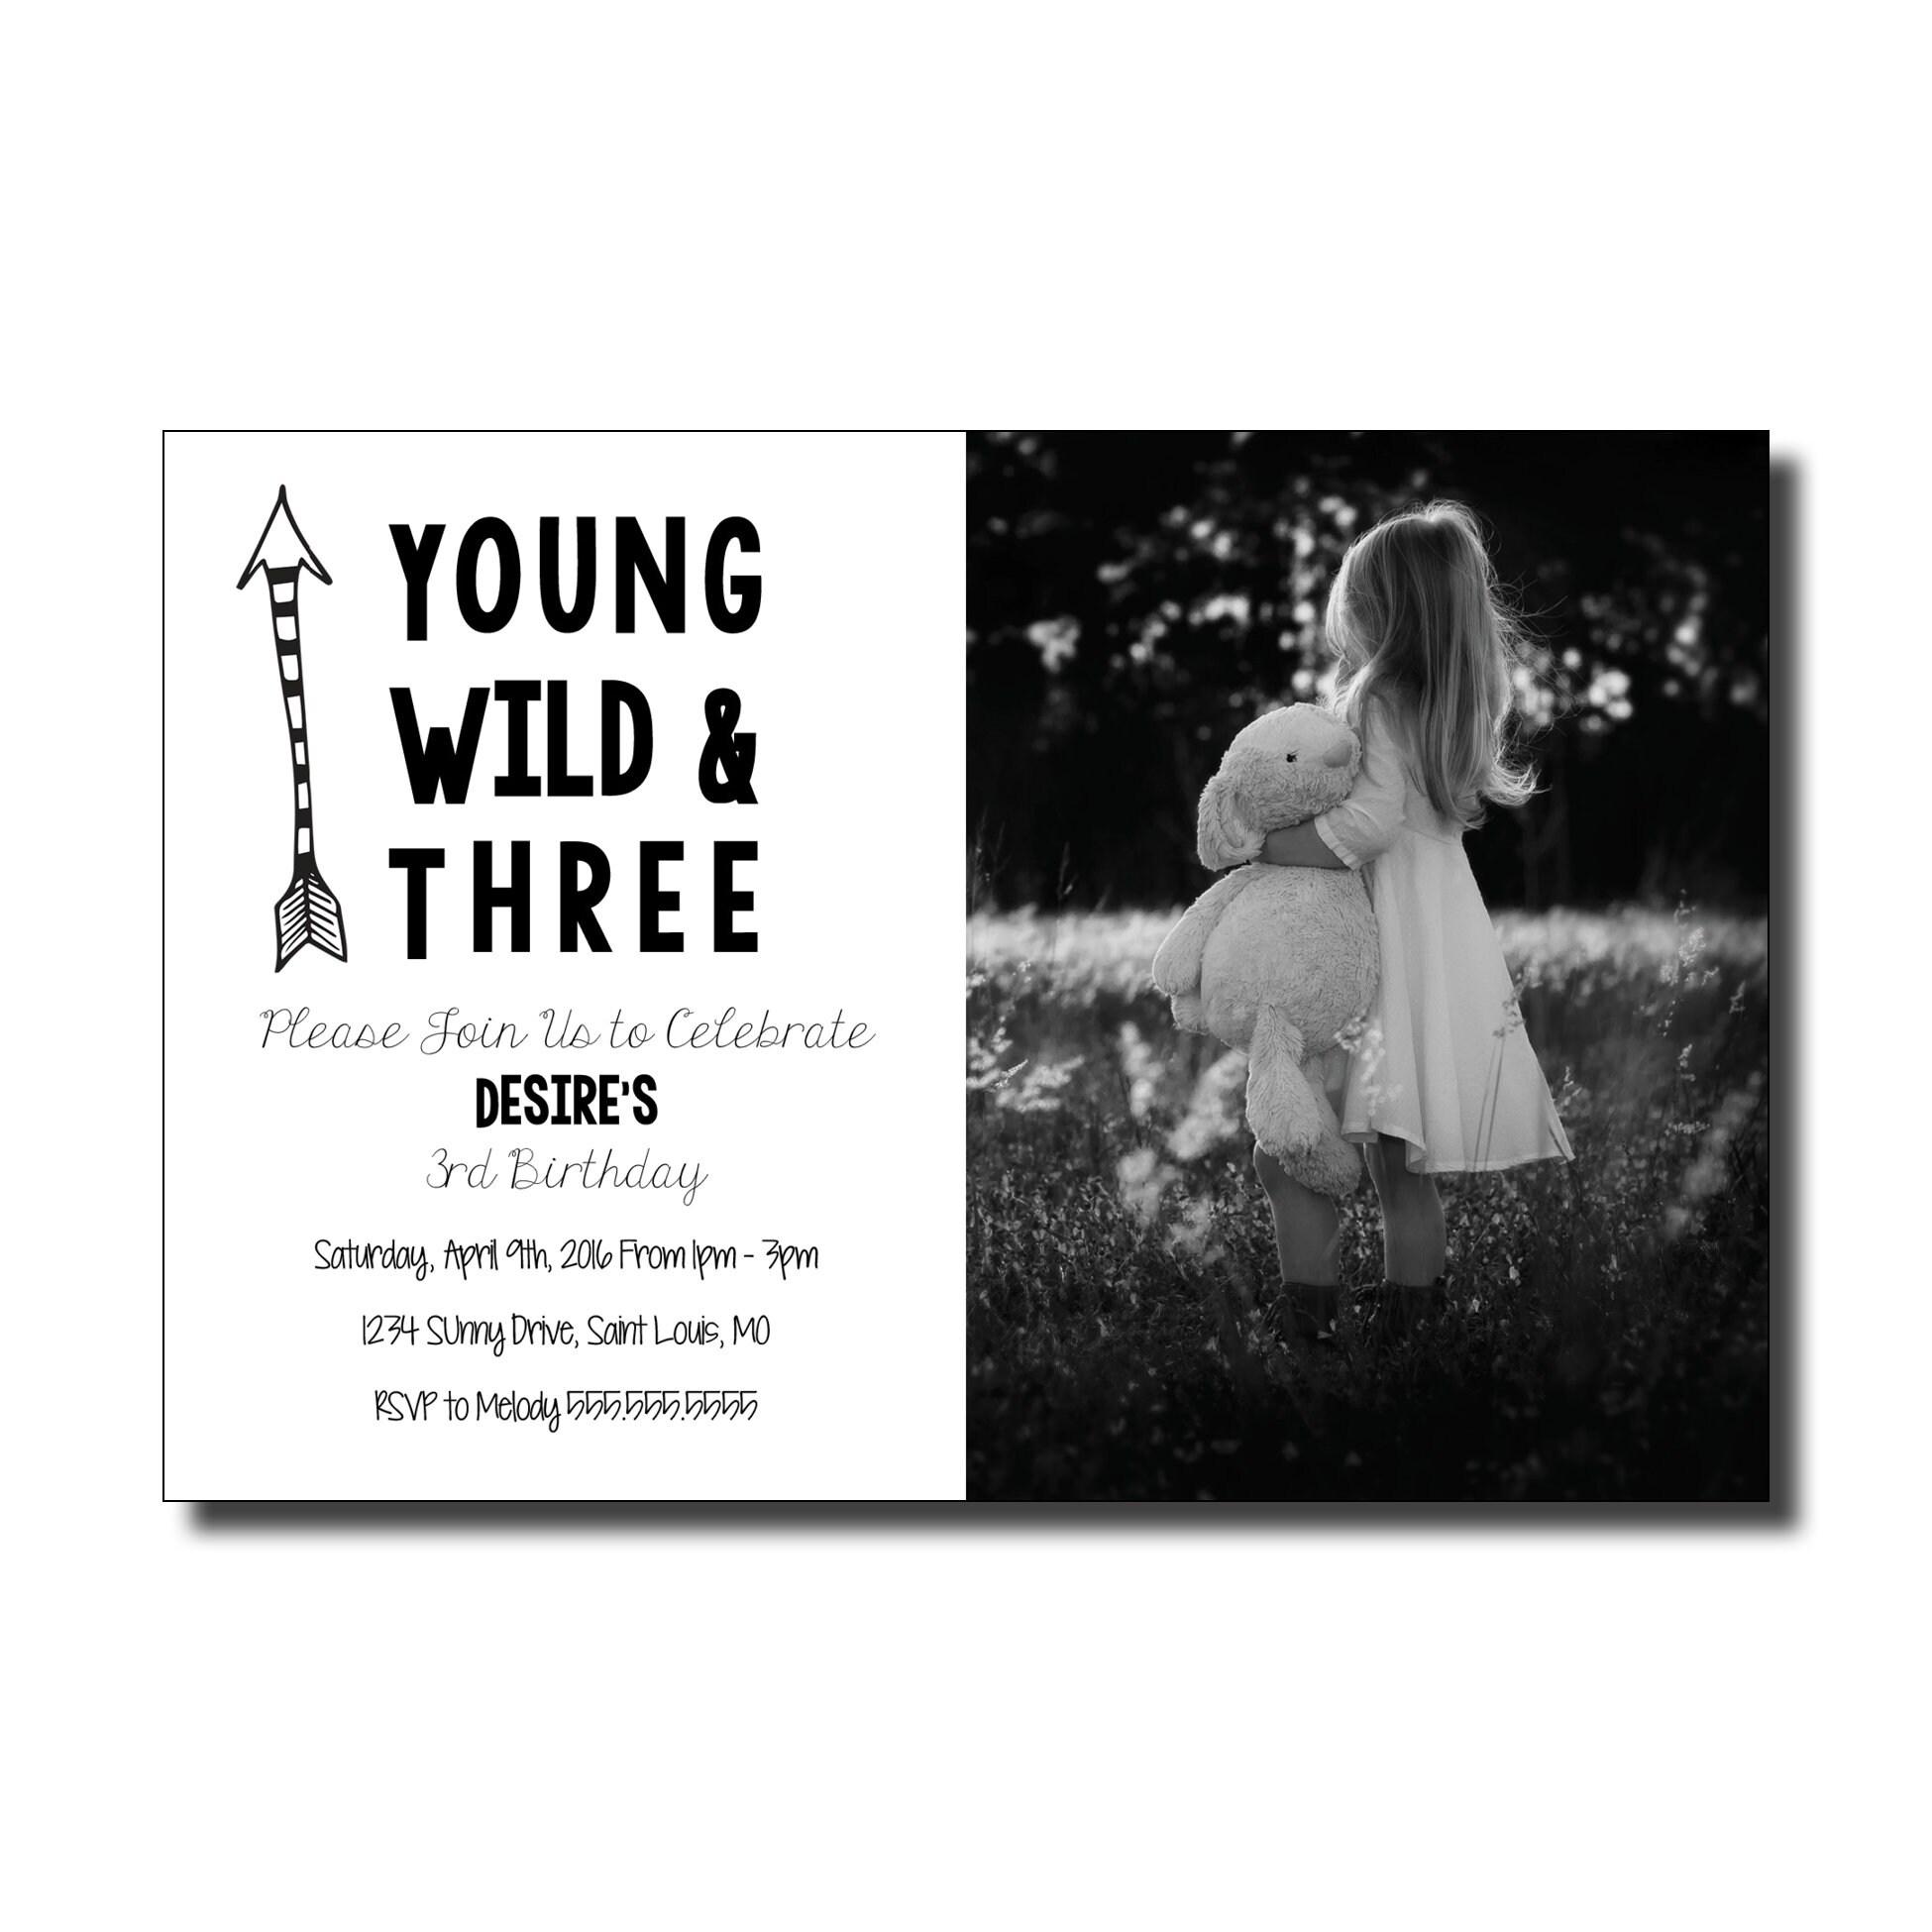 Printed Birthday Invitations Gallery Photo